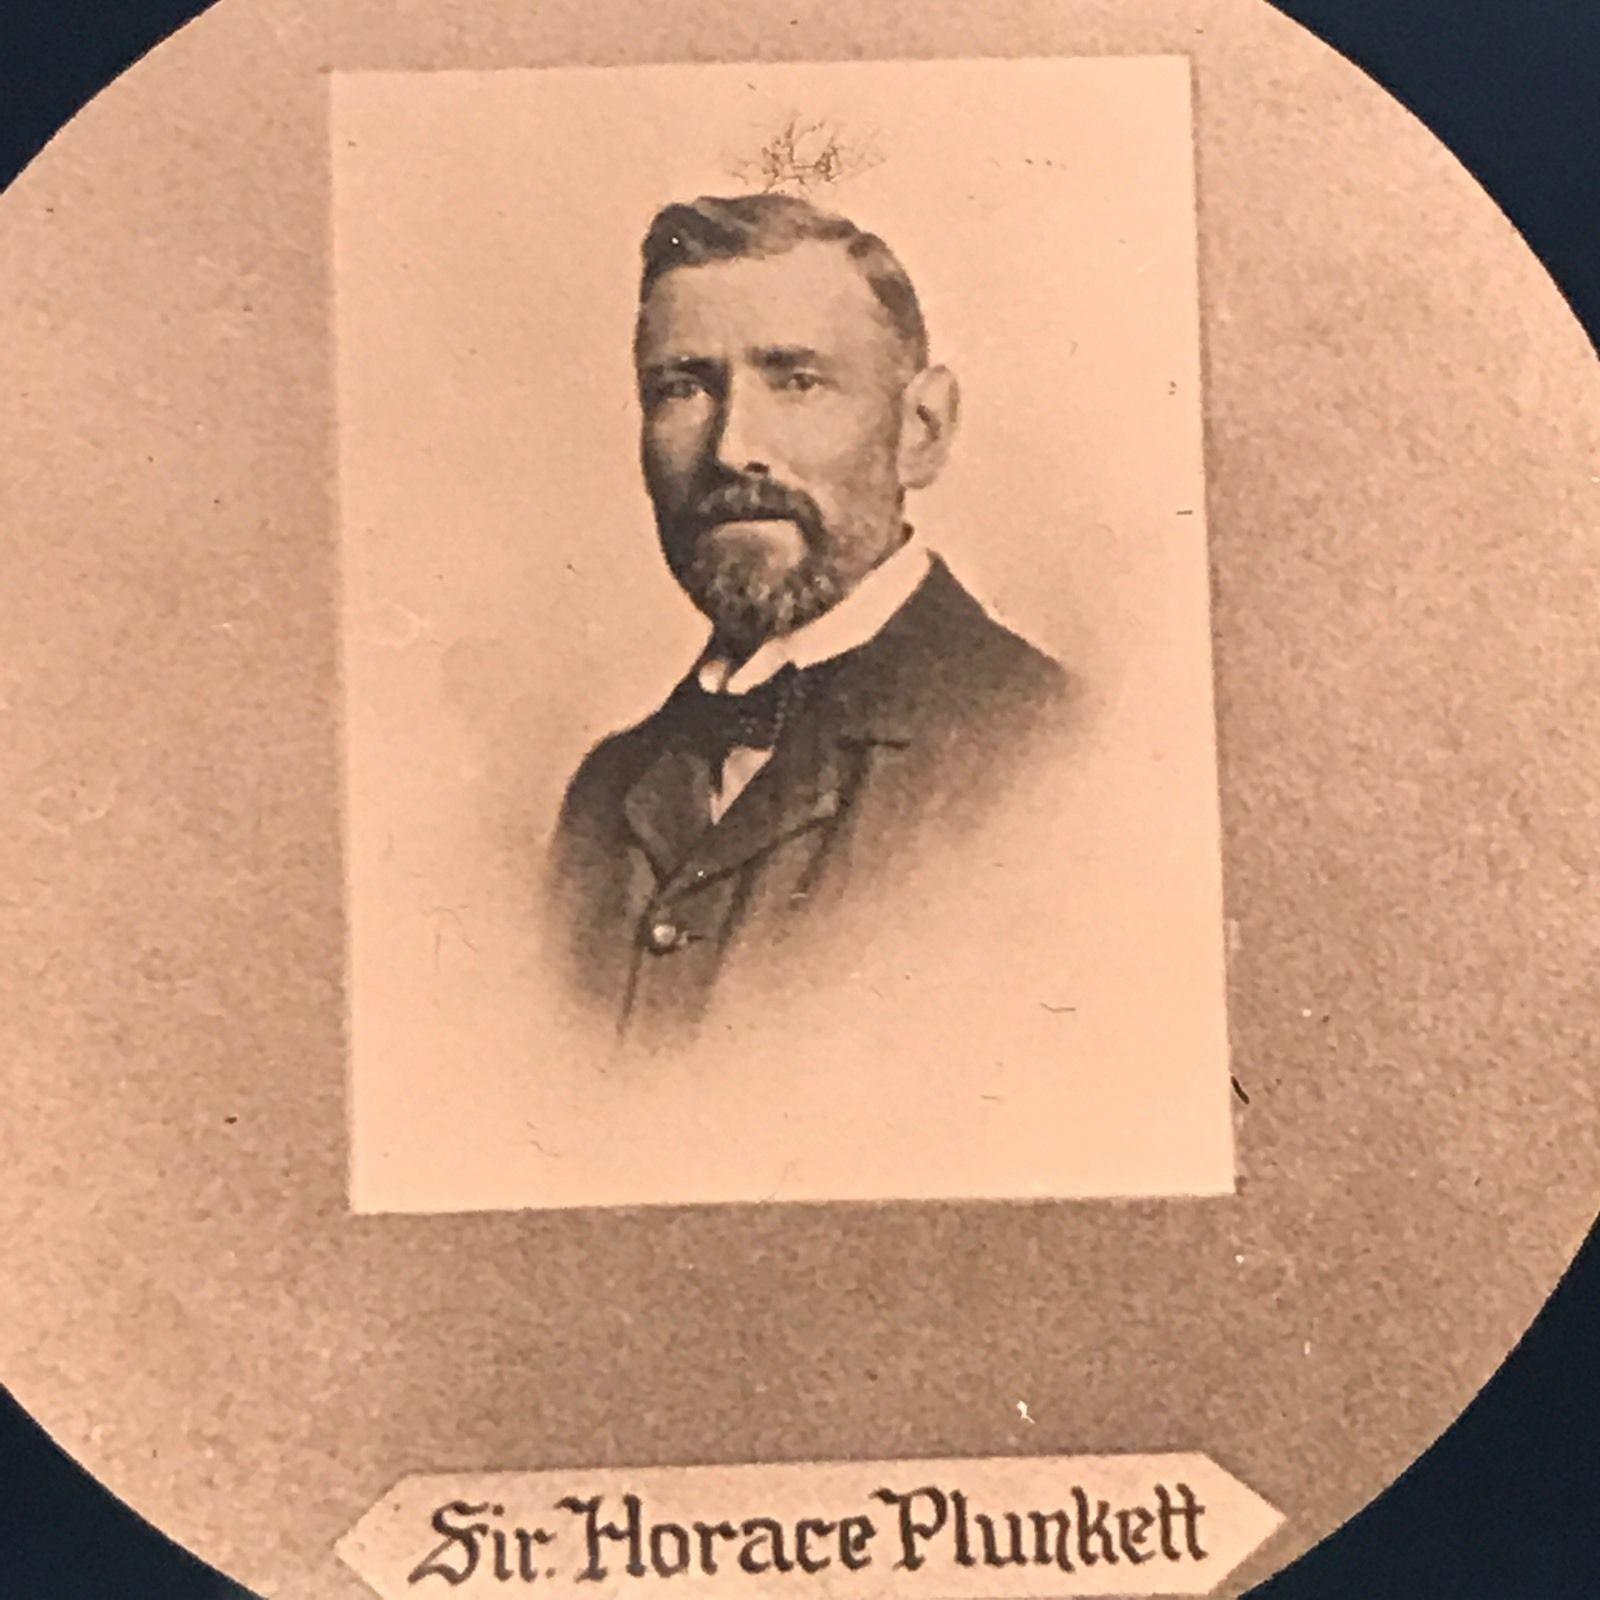 Vtg Magic Lantern Glass Slide Photo Battle Creek Sanitarium Sir Horace Plunkett